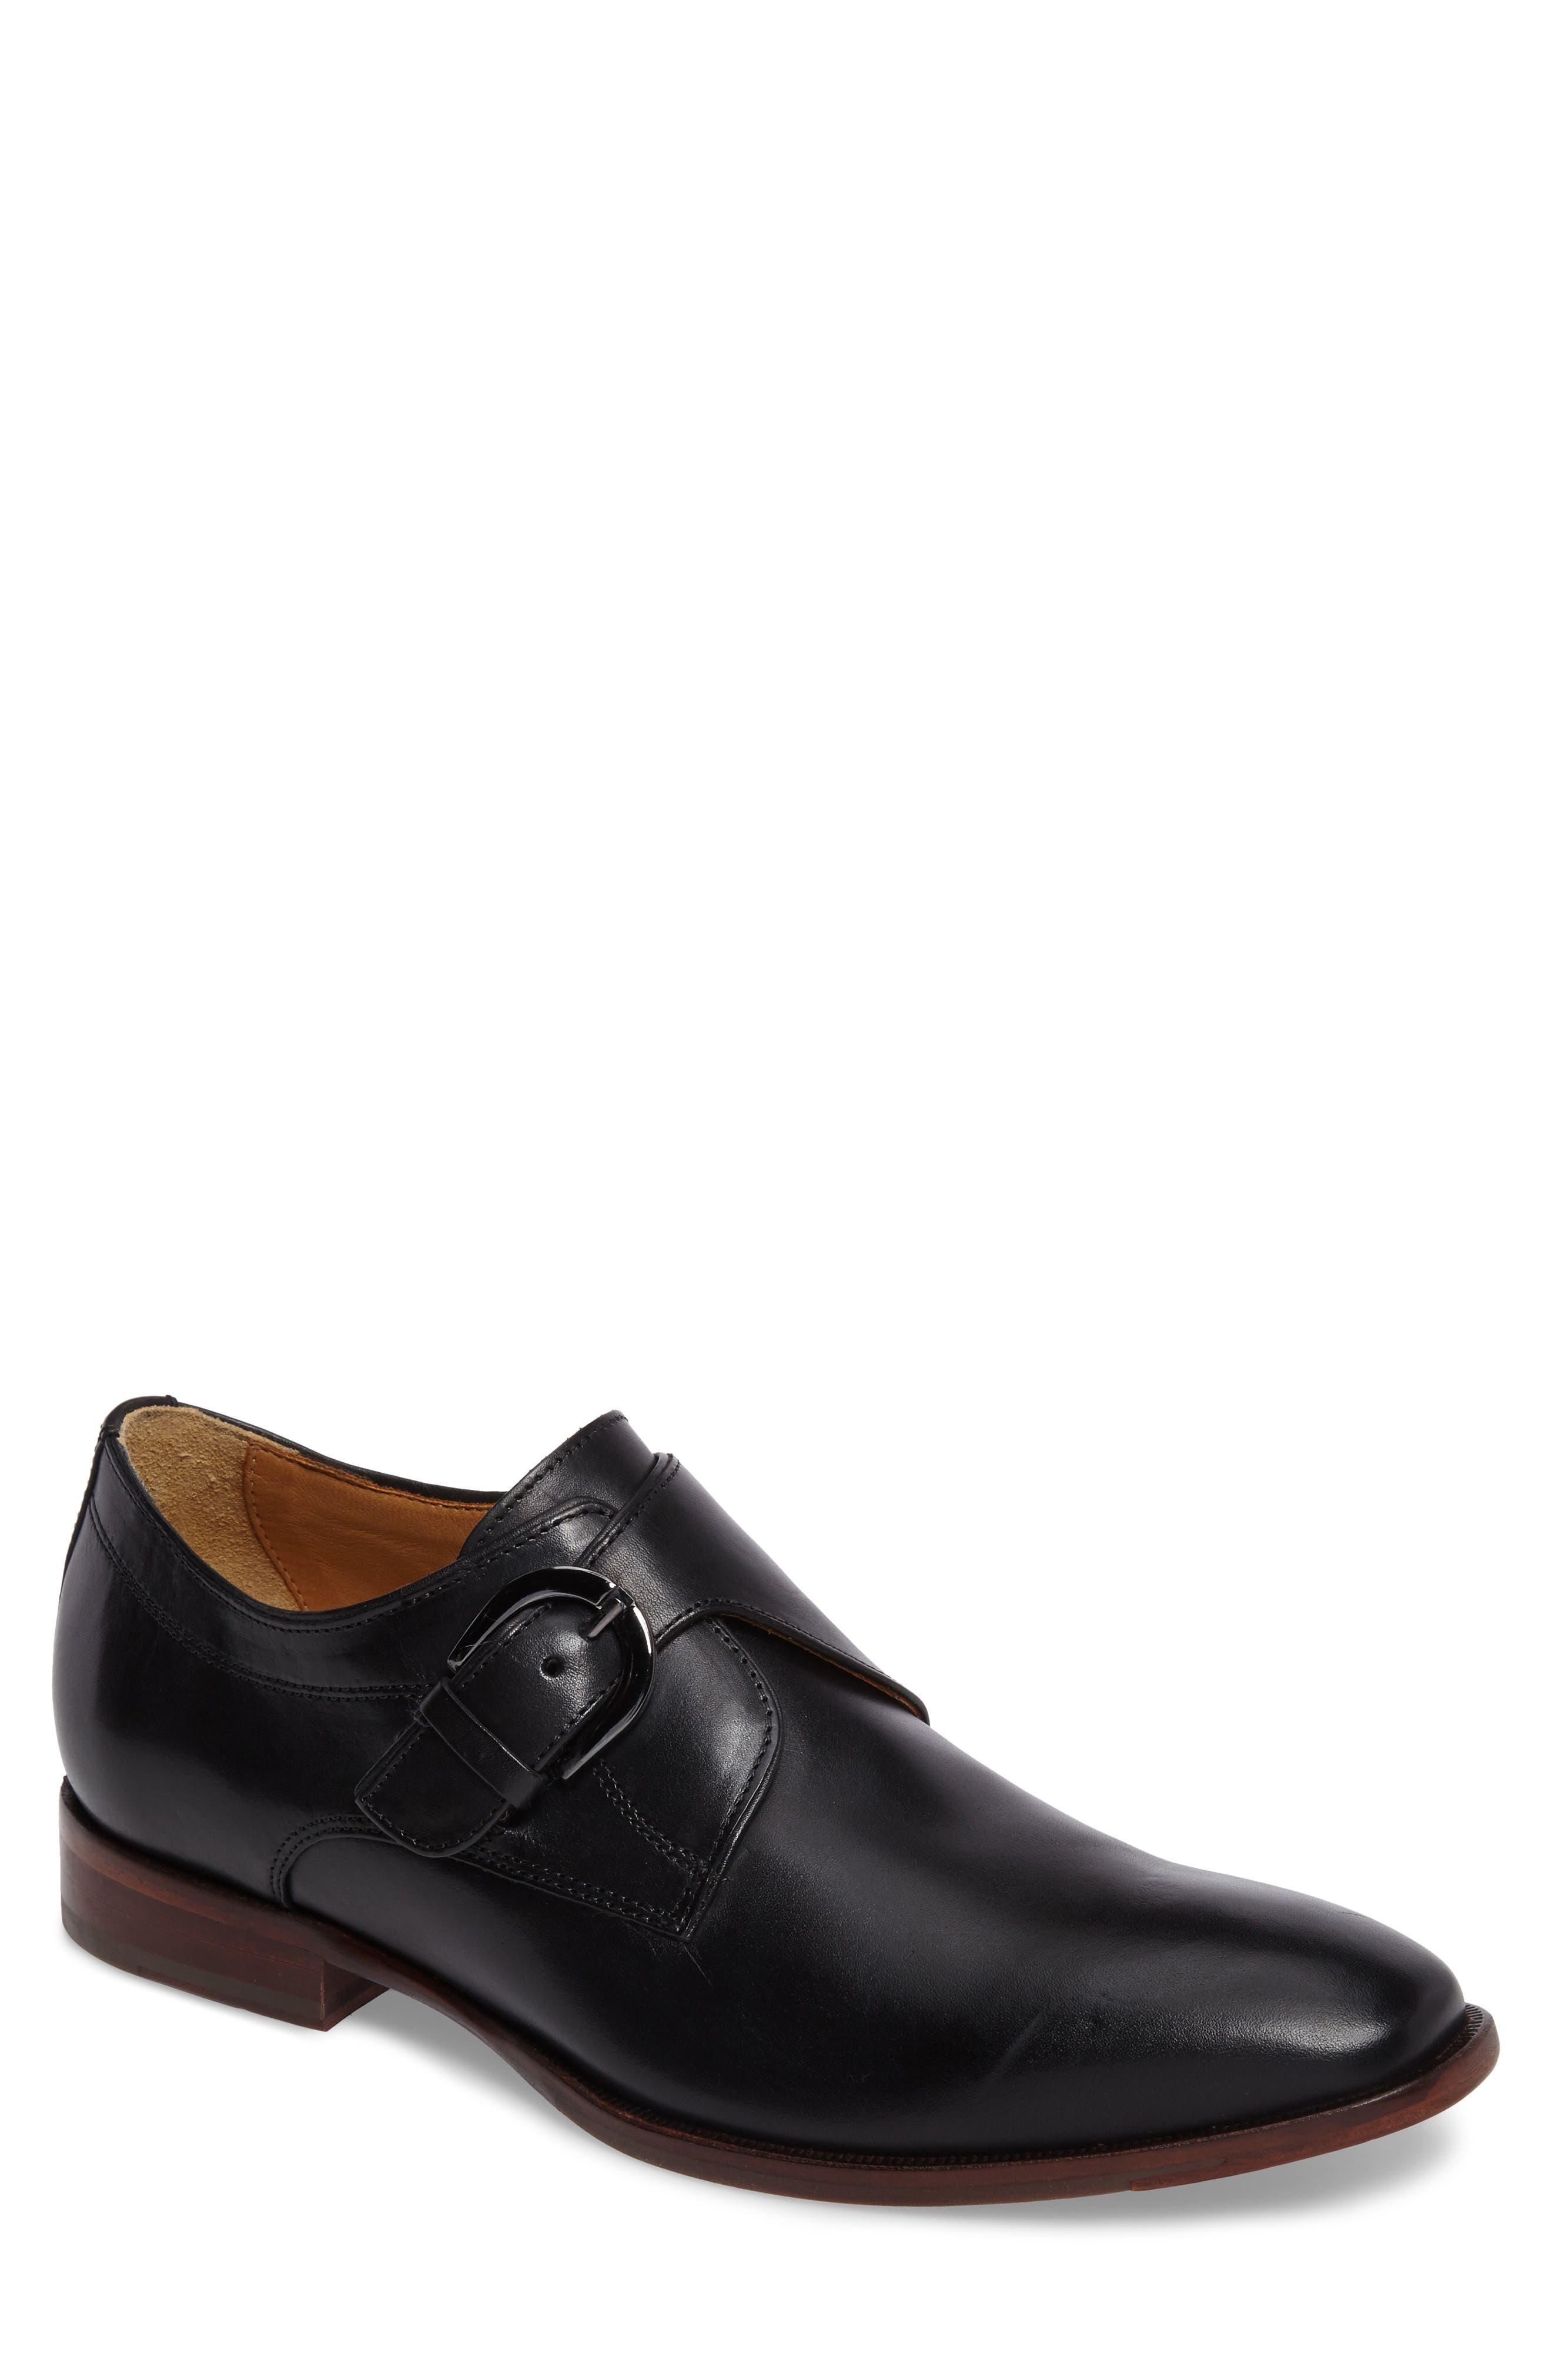 JOHNSTON & MURPHY, McClain Monk Strap Shoe, Main thumbnail 1, color, BLACK